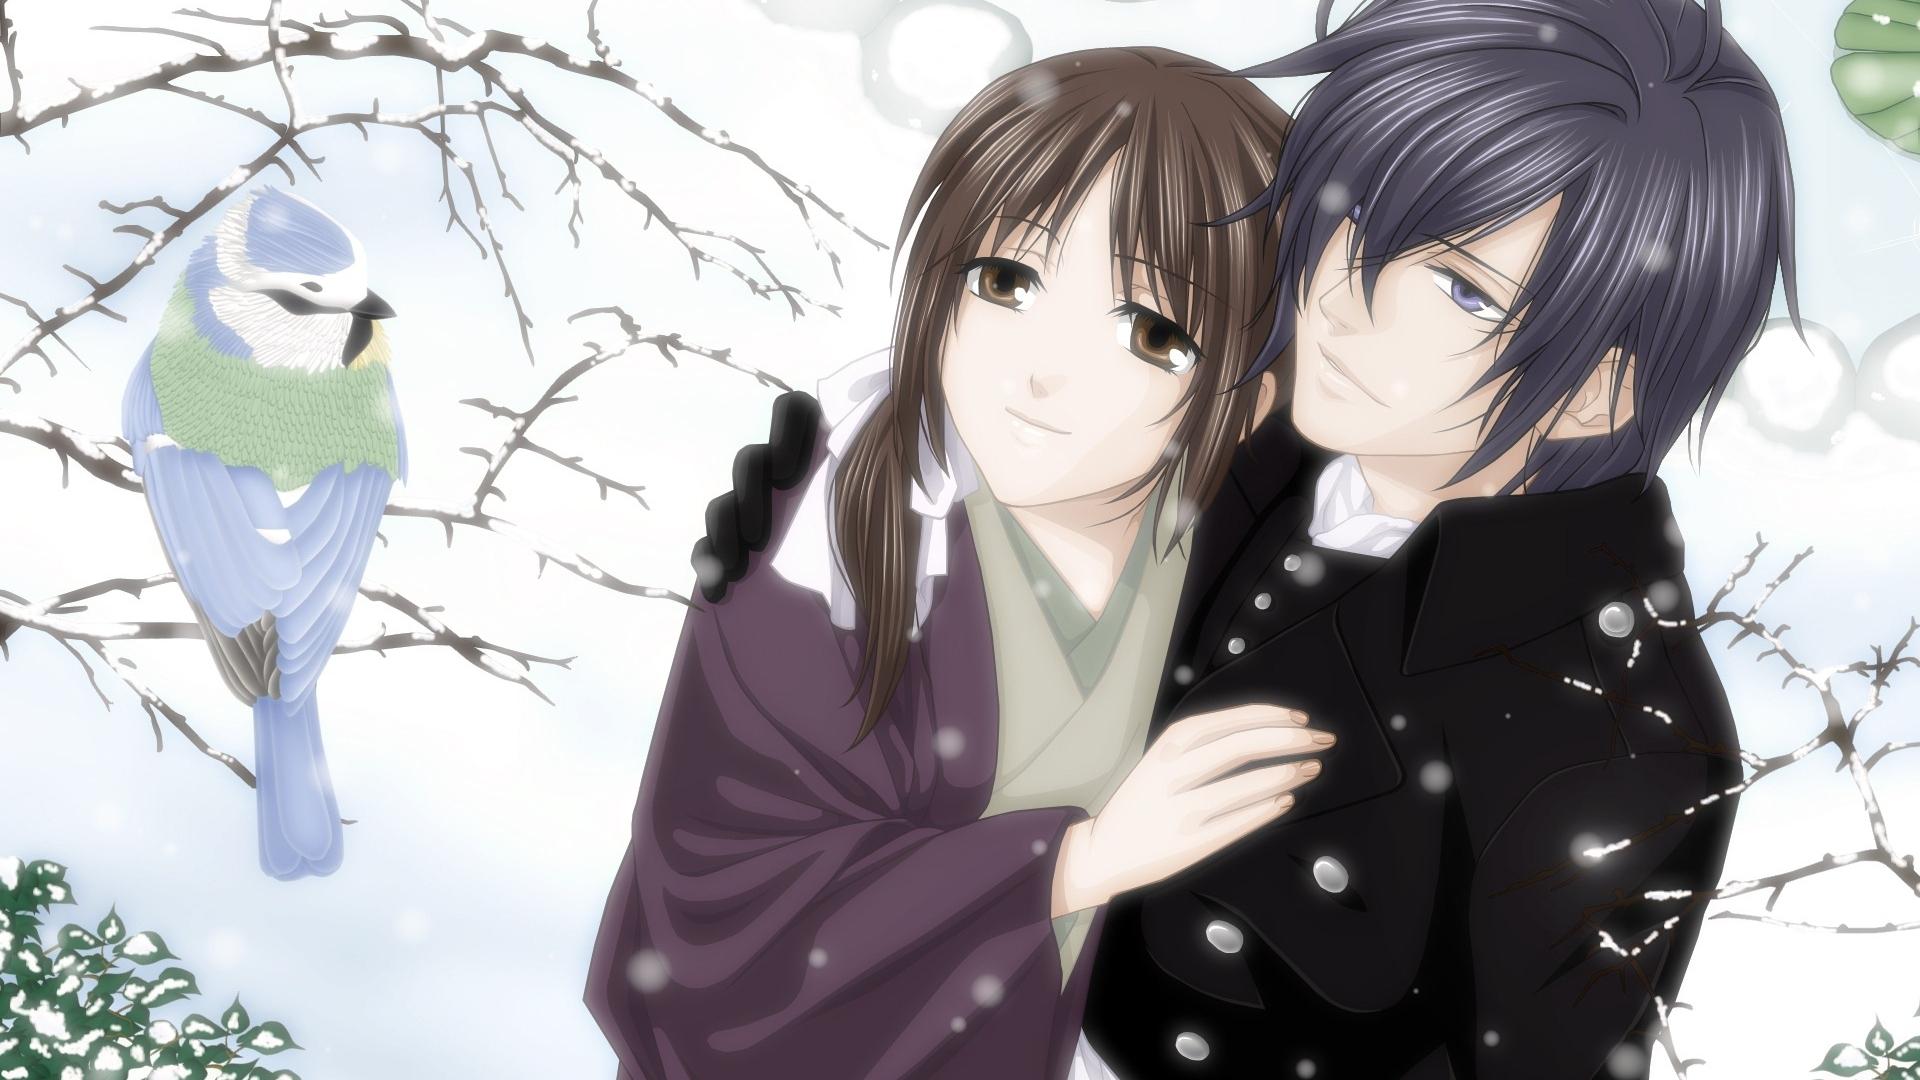 Wallpaper : anime, snow, winter, black hair, couple ...